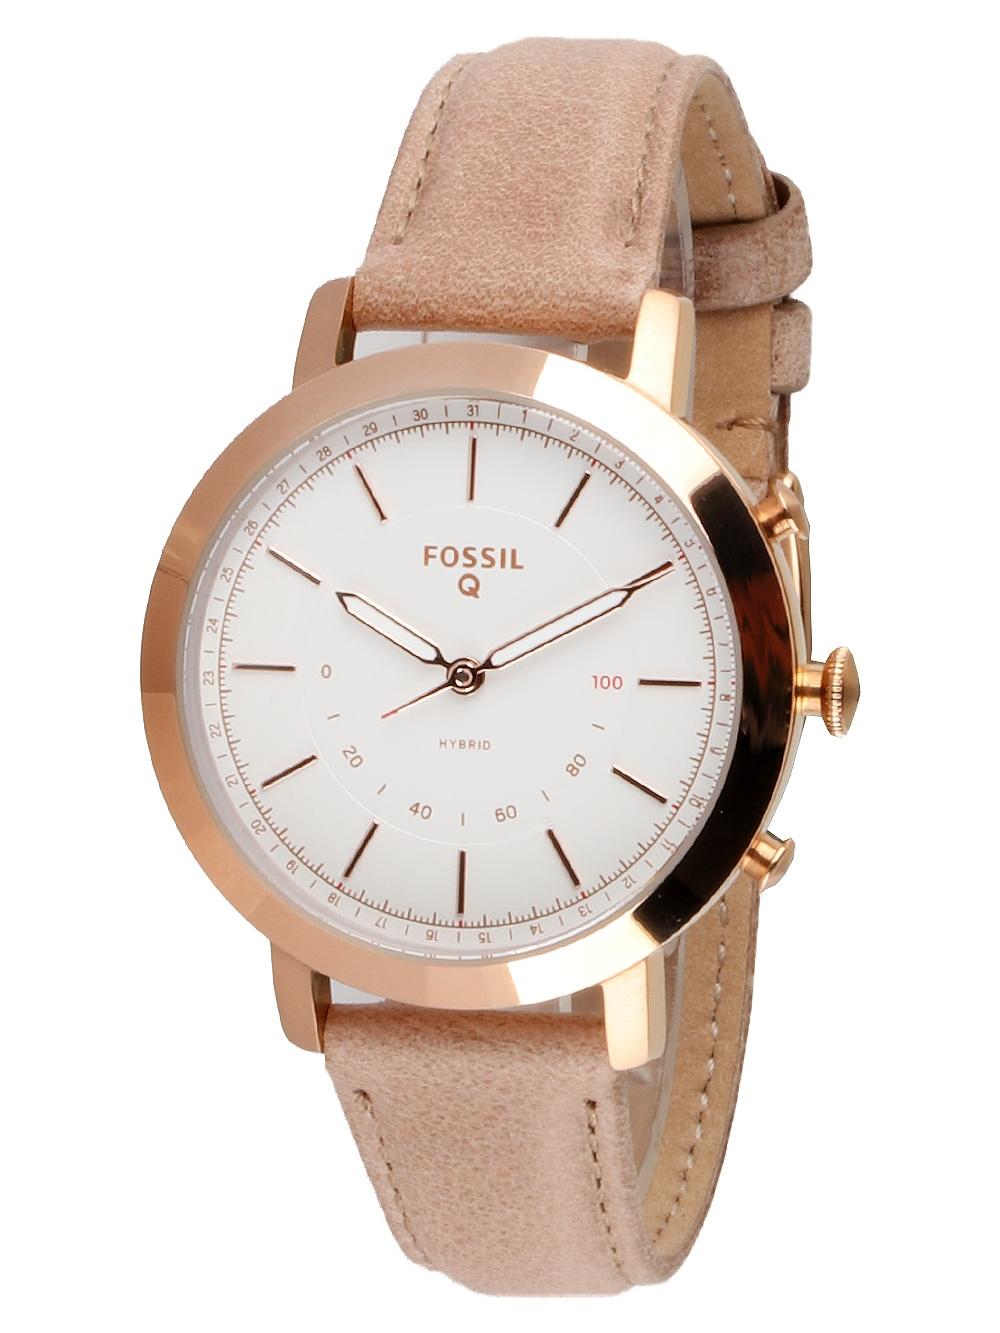 Q FTW5007 Neely Damen Hybrid Smartwatch 36mm 5ATM